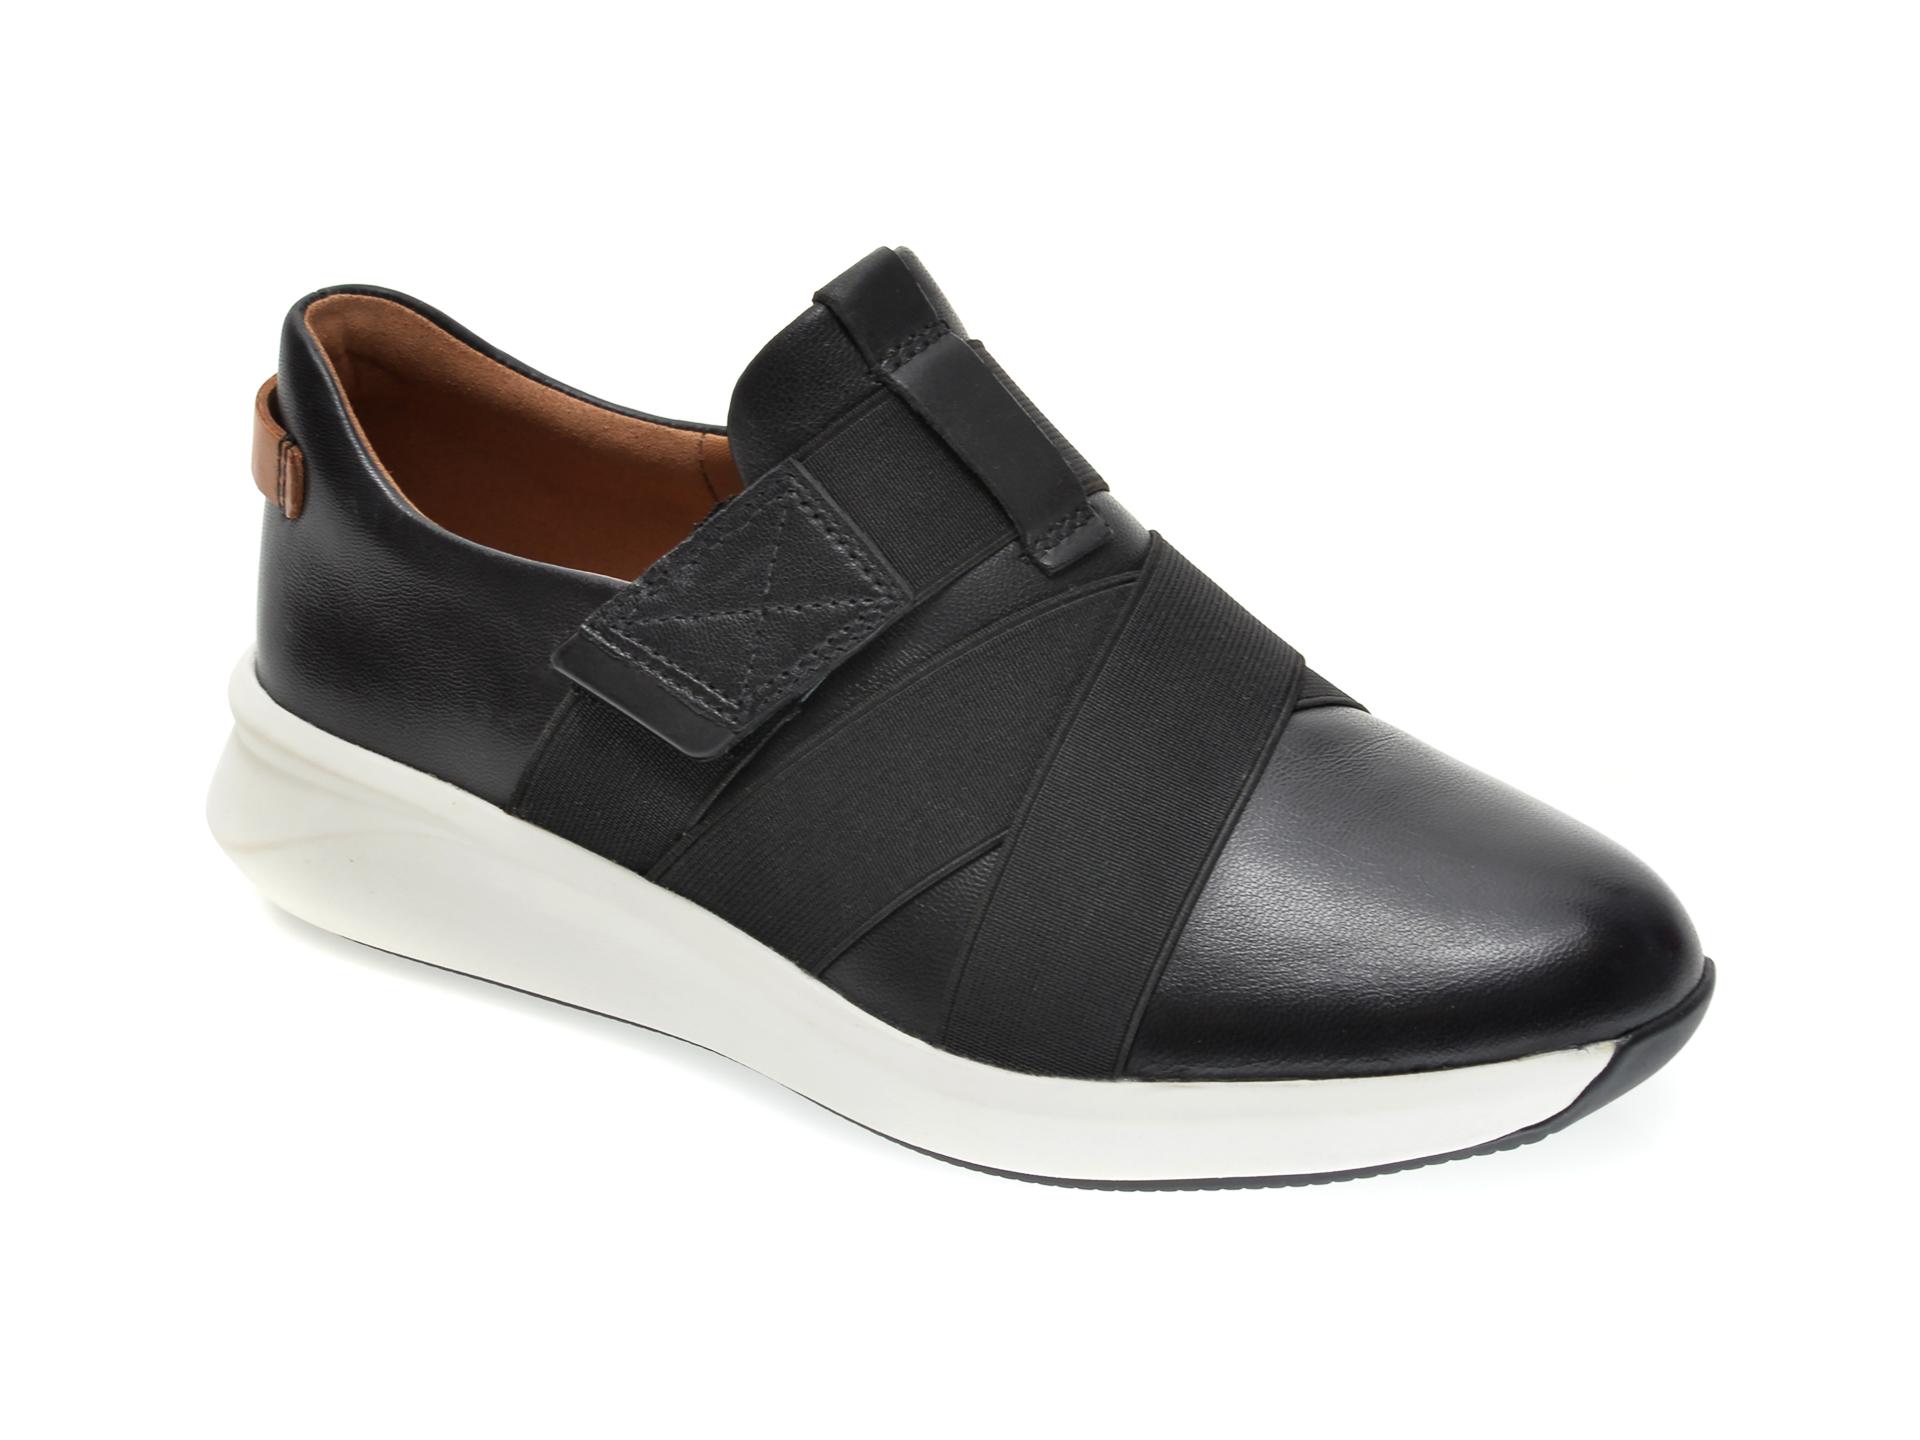 Pantofi CLARKS negri, UN RIO STRAP, din material textil si piele naturala